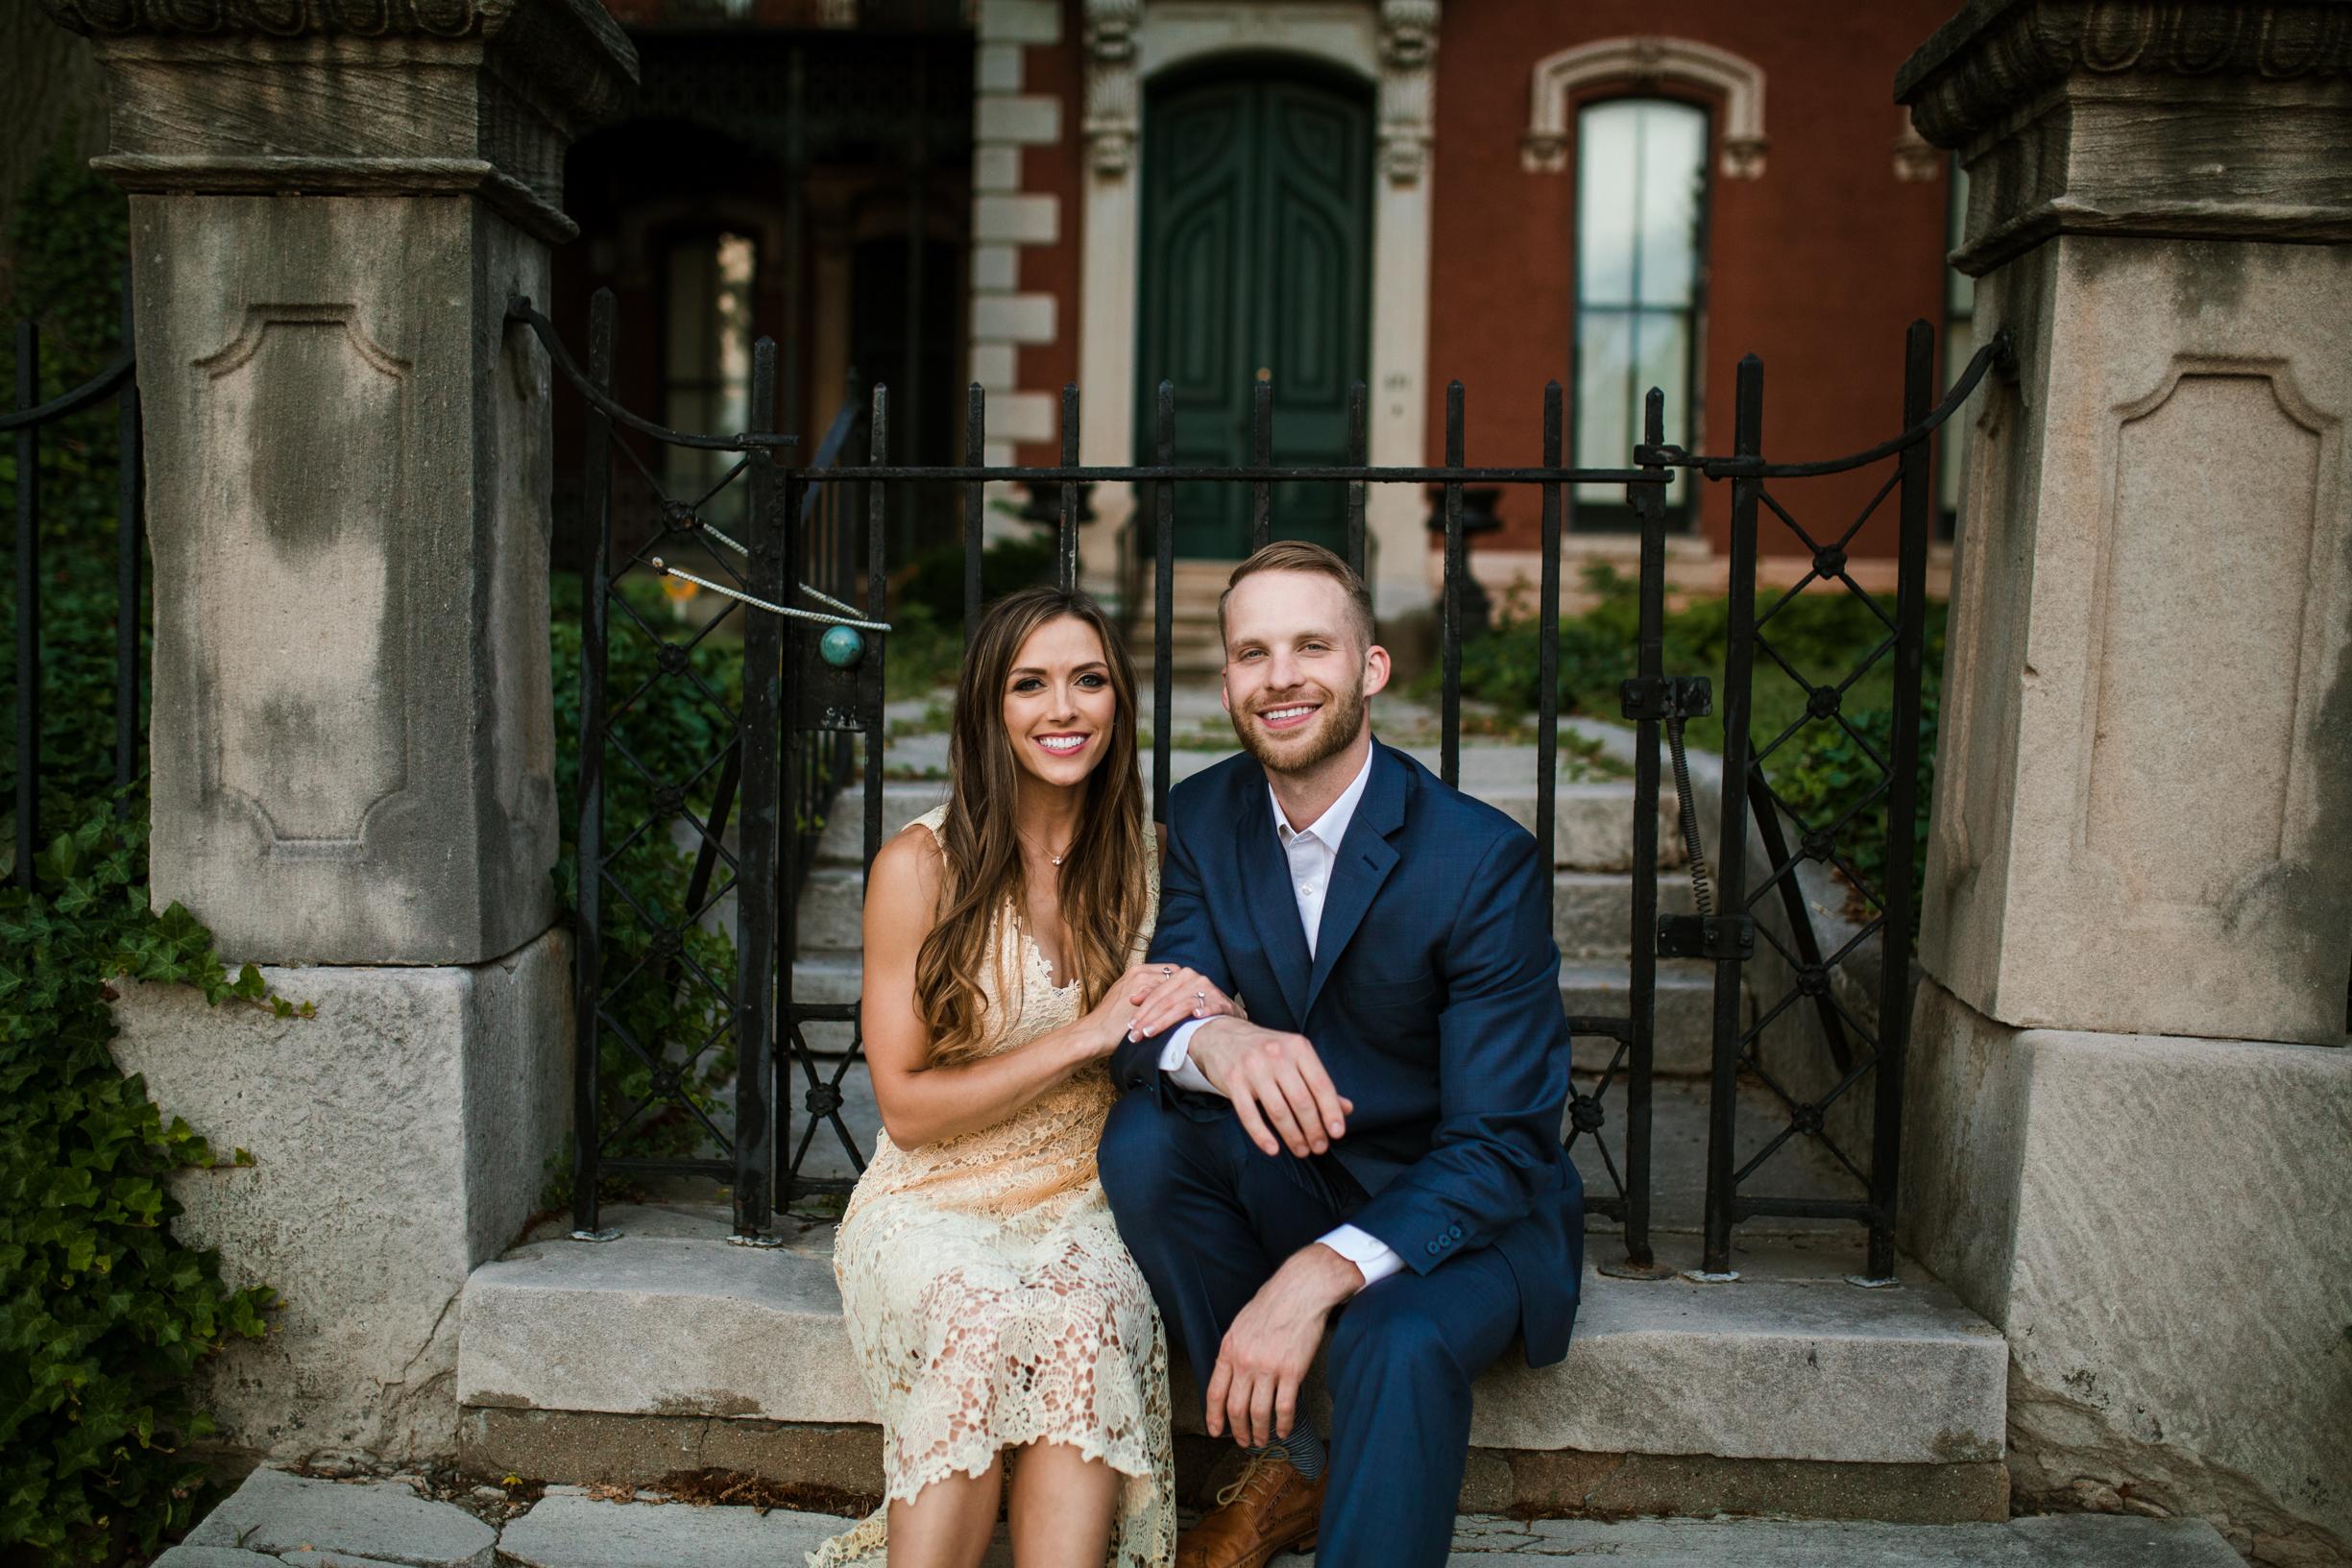 Victoria & Chad Engagement 2018 Crystal Ludwick Photo Louisville Kentucky Wedding Photographer WEBSITE (25 of 48).jpg